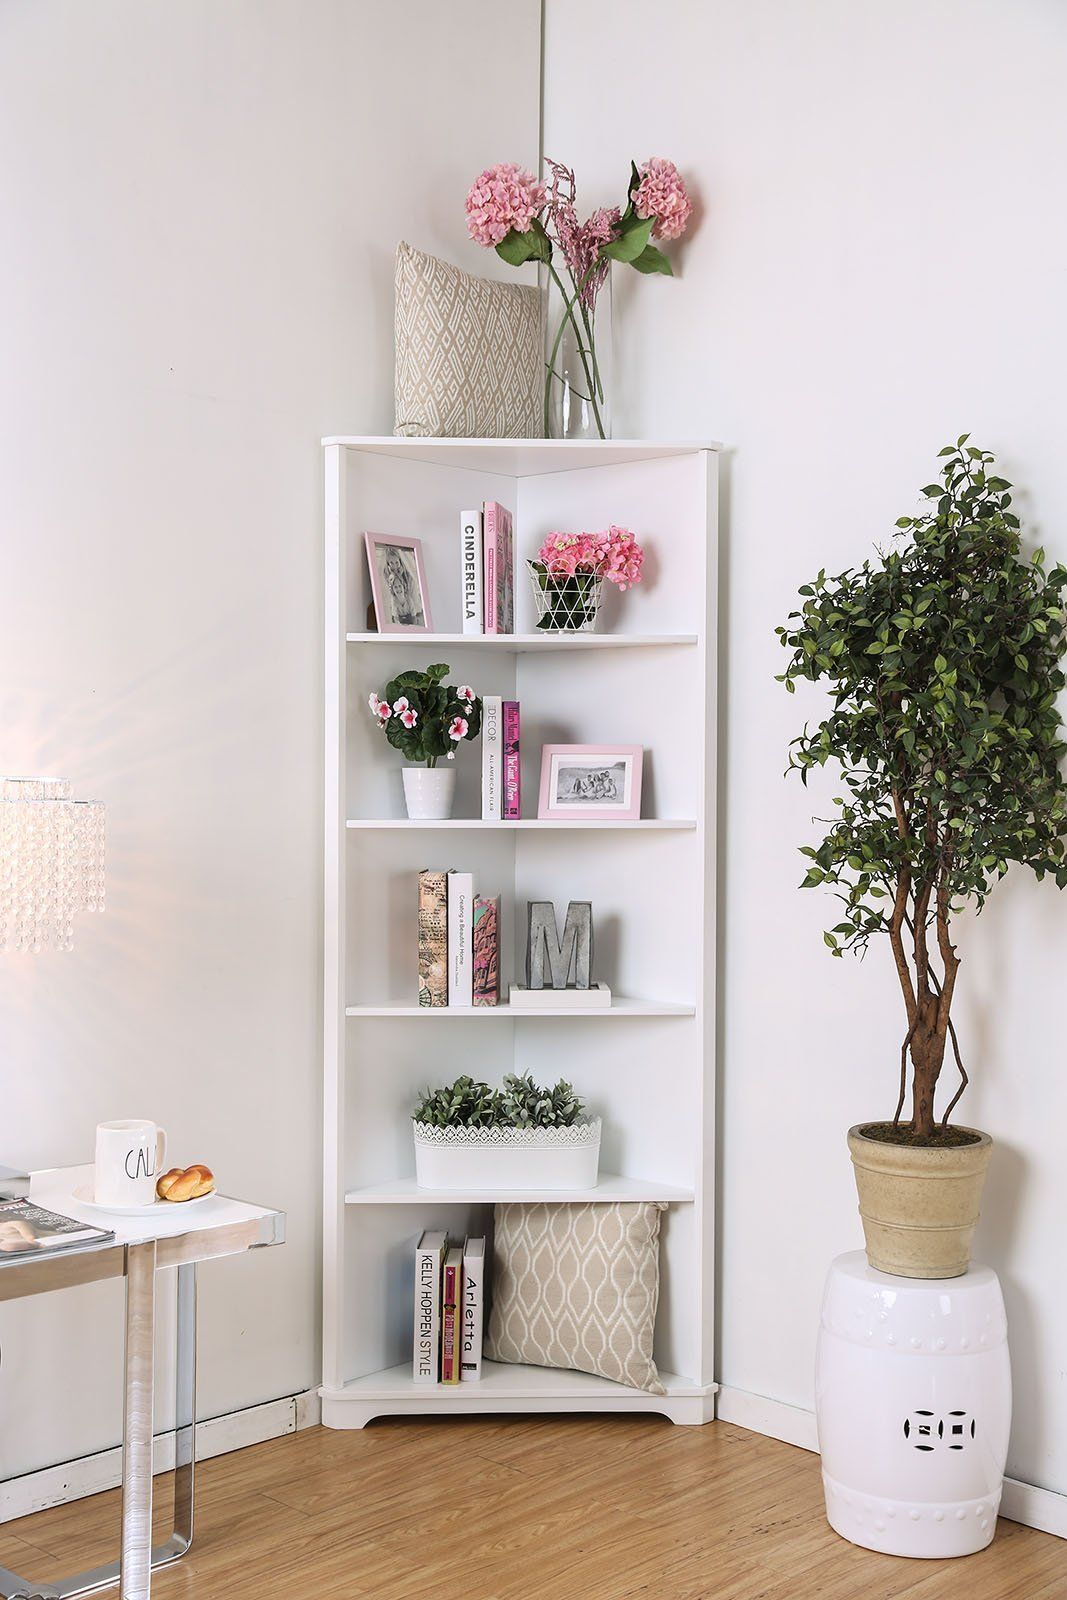 Contemporary Style Solid Wood Five Shelves Corner Bookshelf White